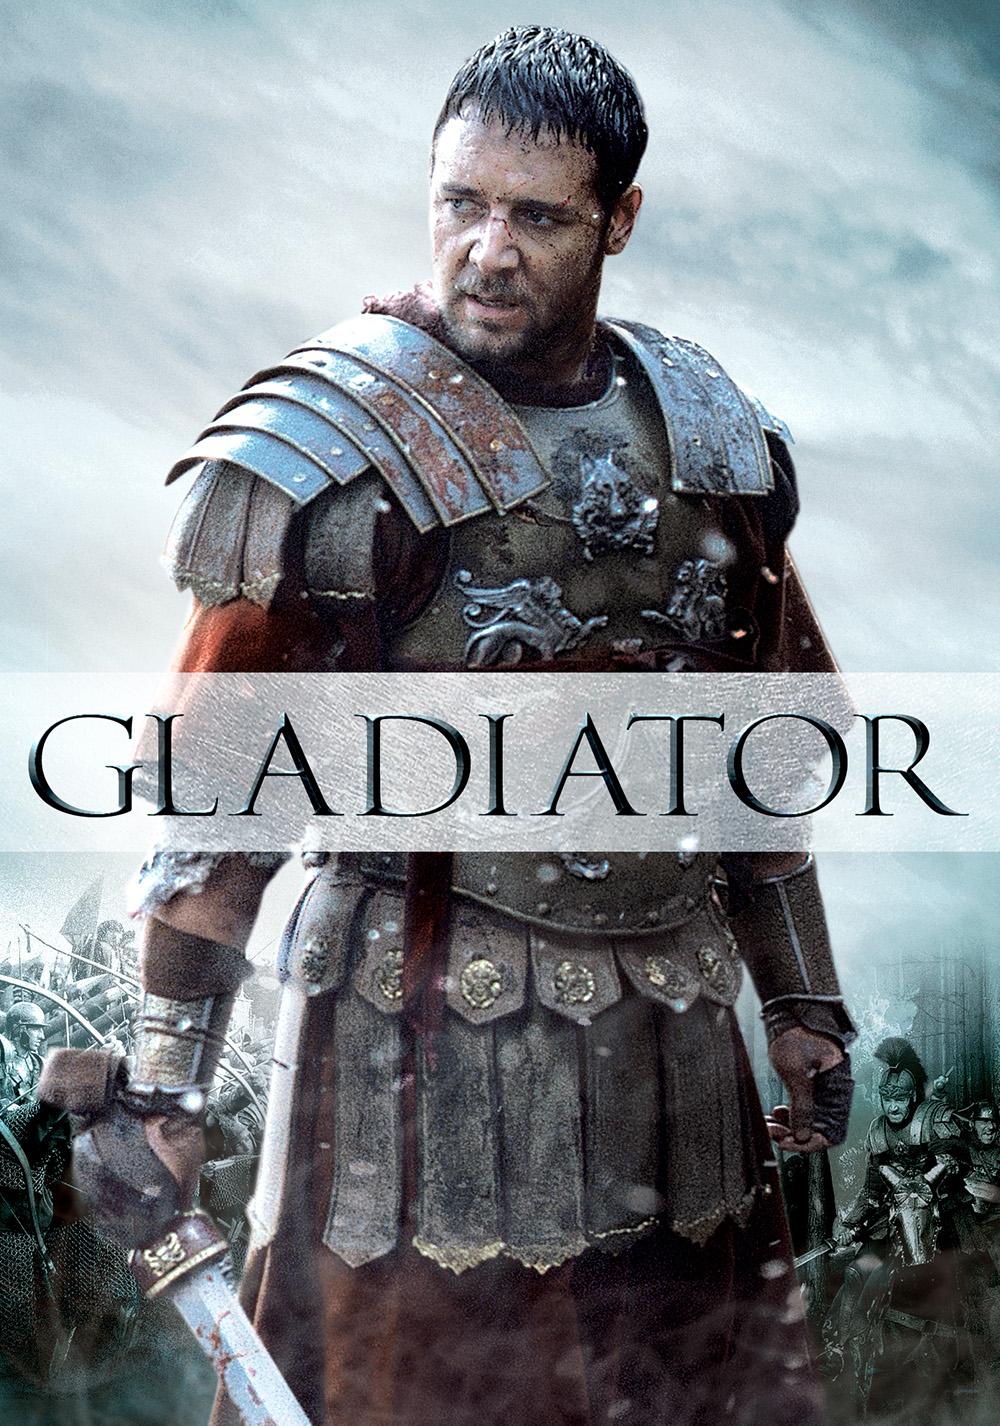 gladiator - photo #15